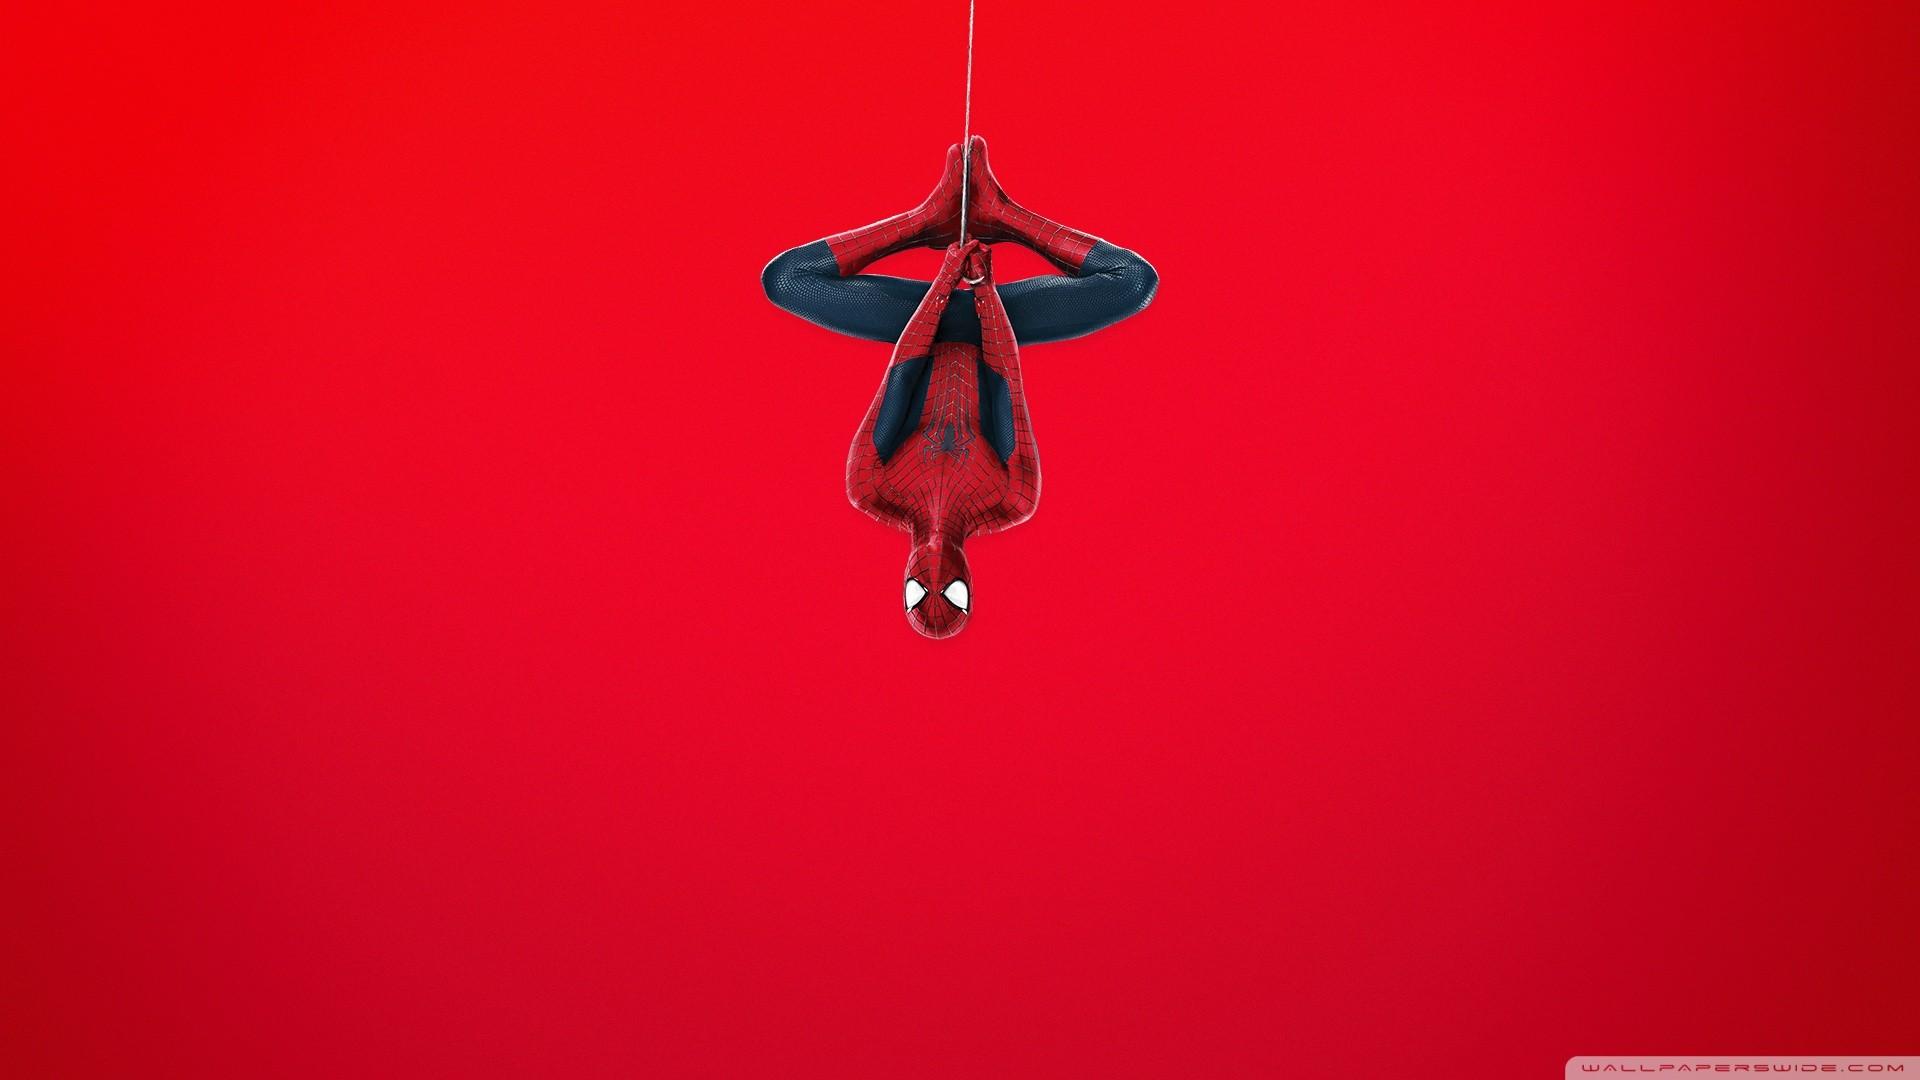 1920x1200 Wallpaperwiki HD Black Spiderman Iphone Image PIC